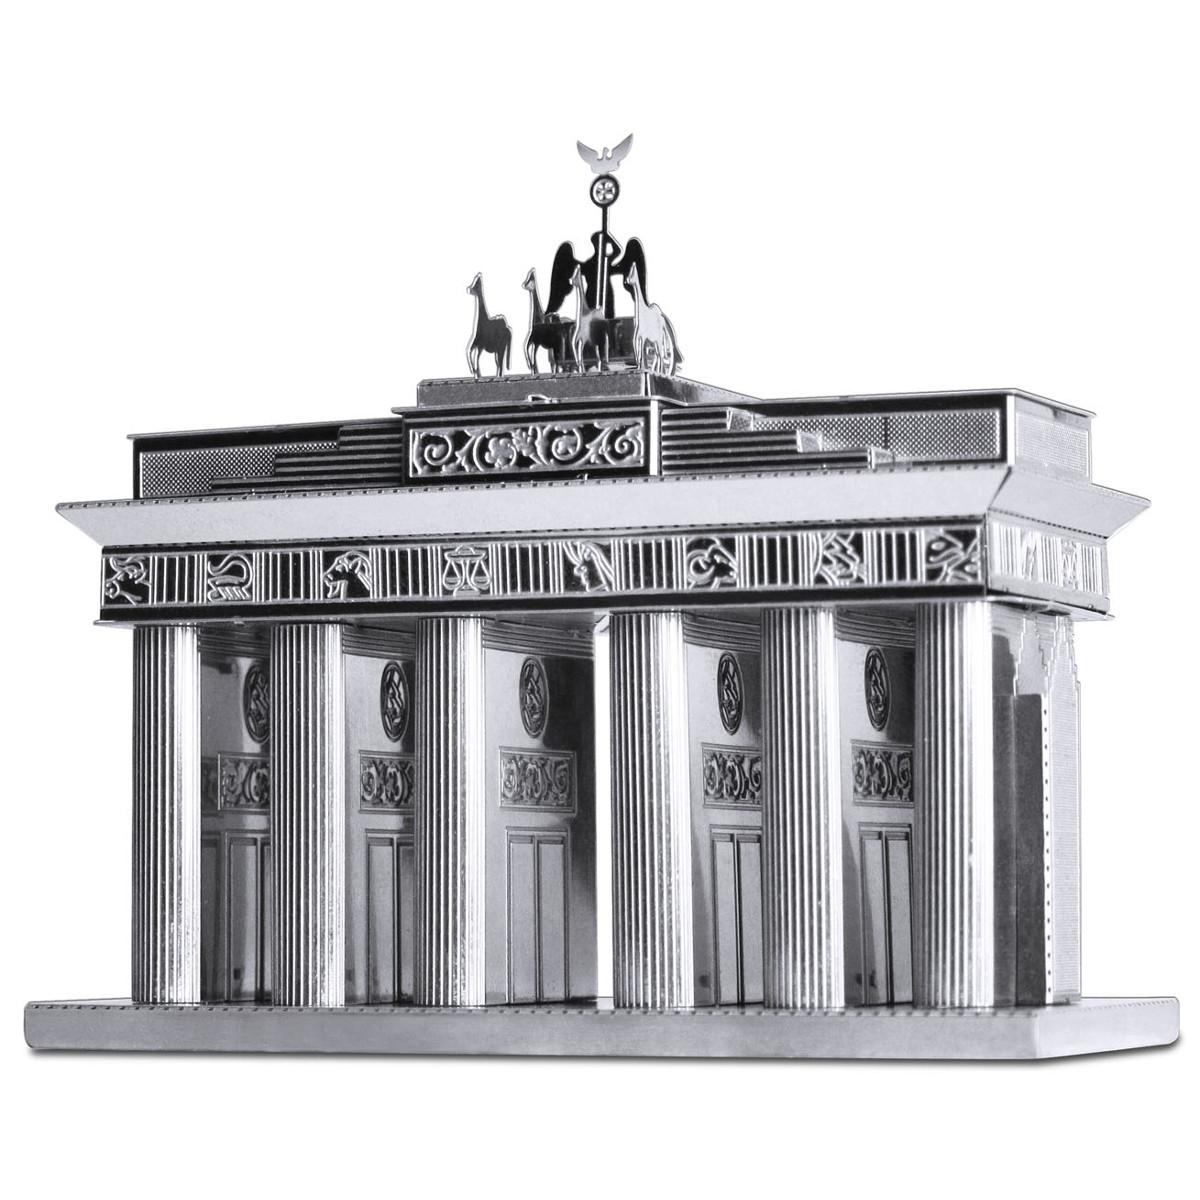 3D-Byggsats i metall: Brandenburger tor